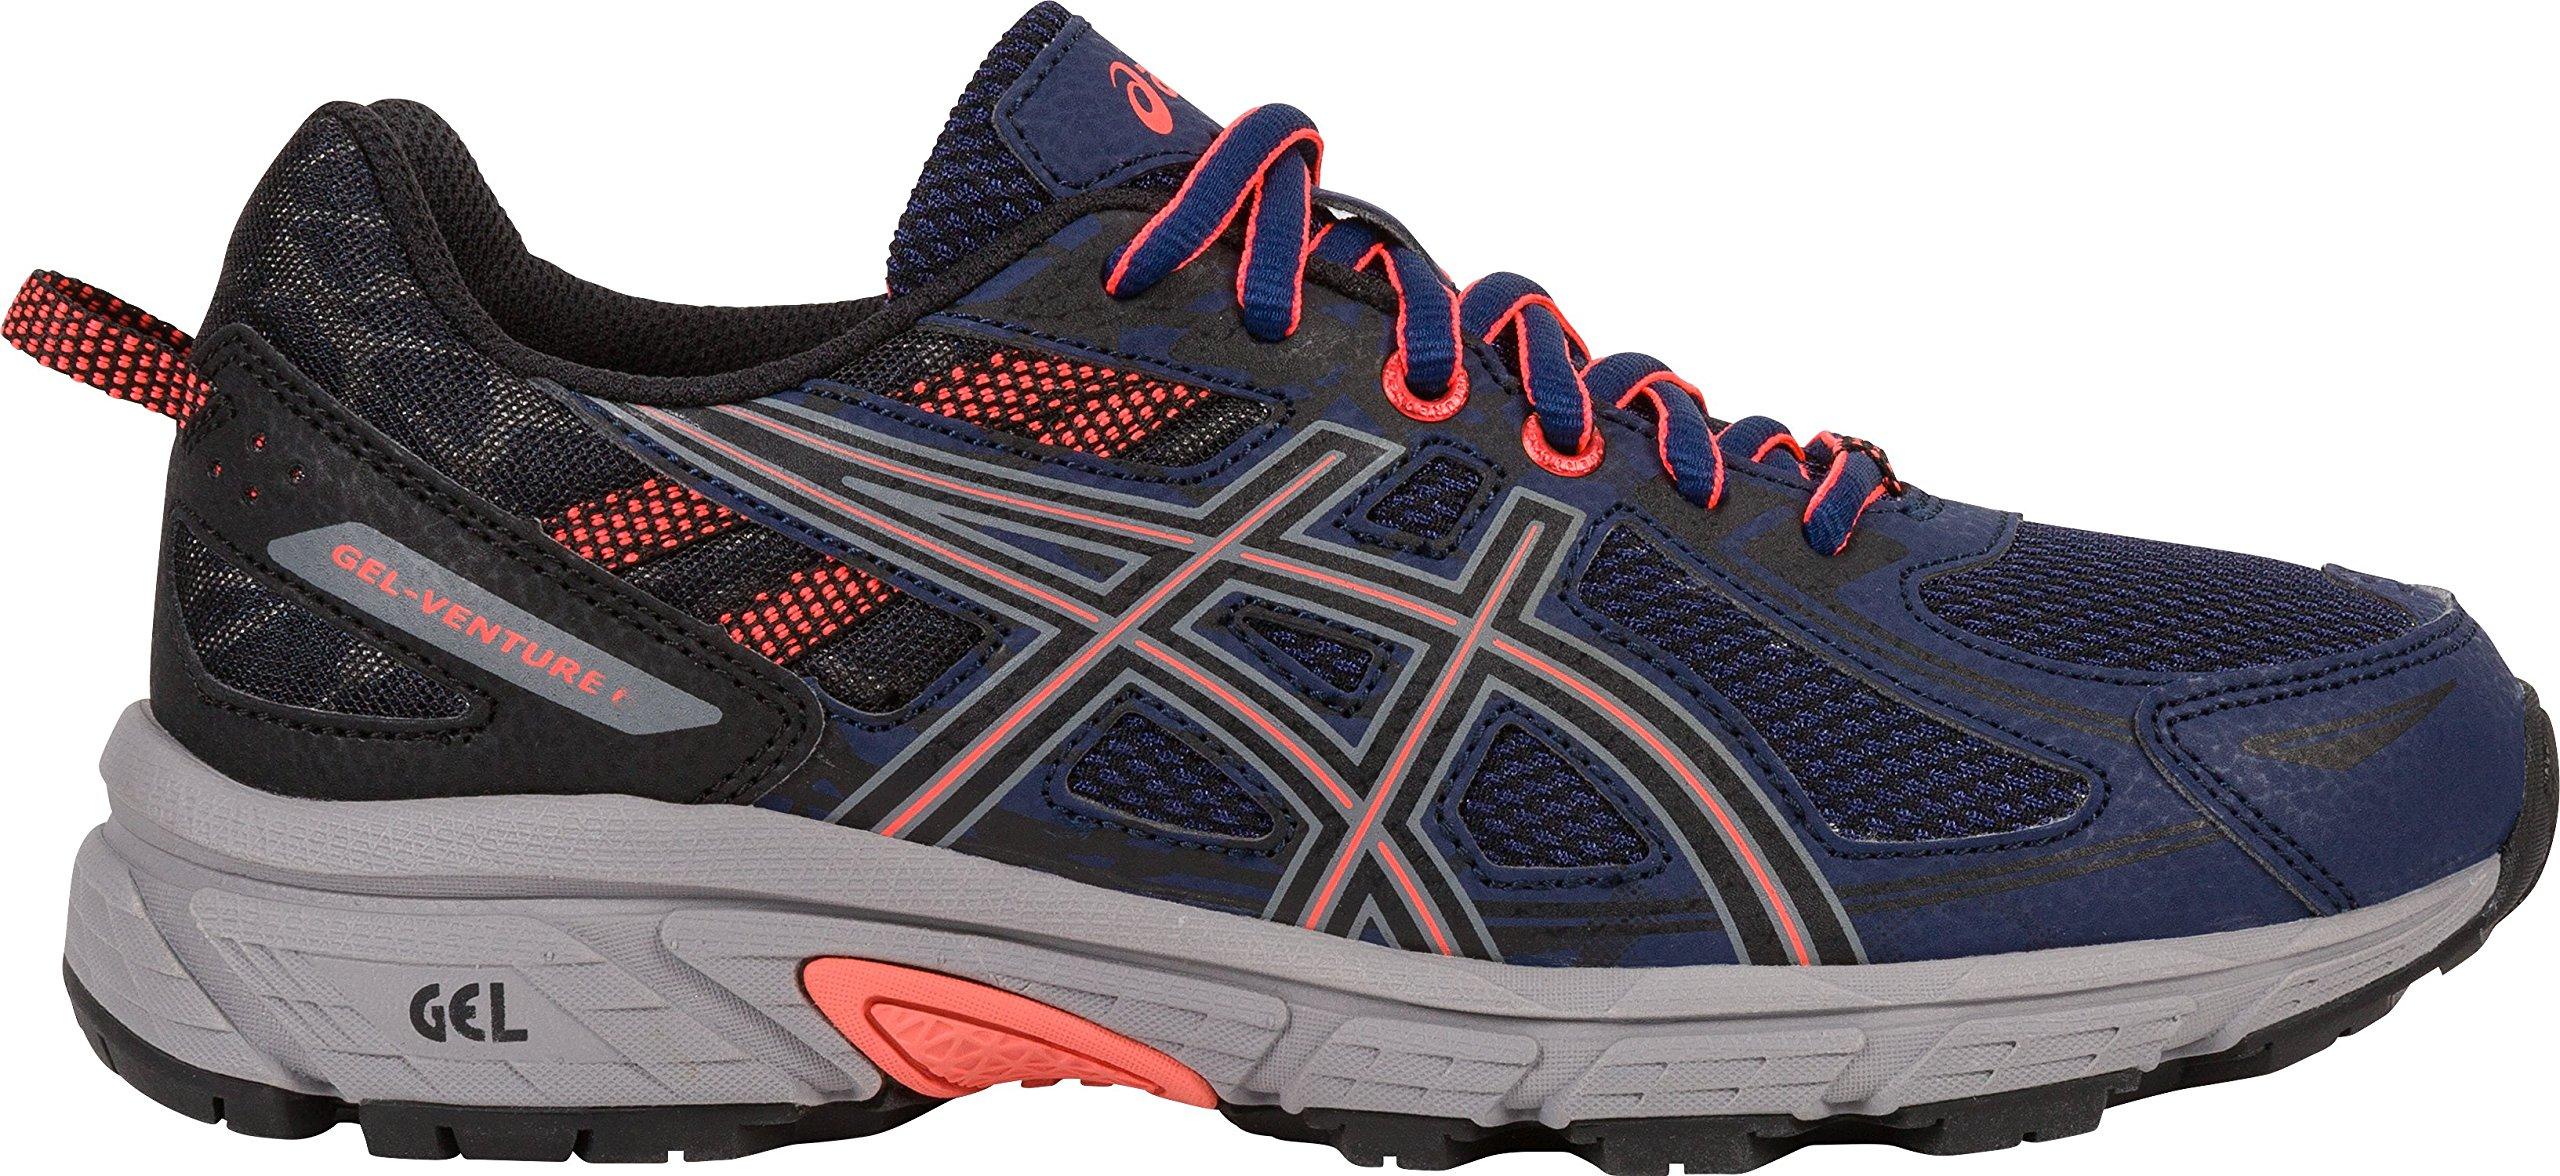 ASICS Womens Gel Venture Running Shoes Indigo